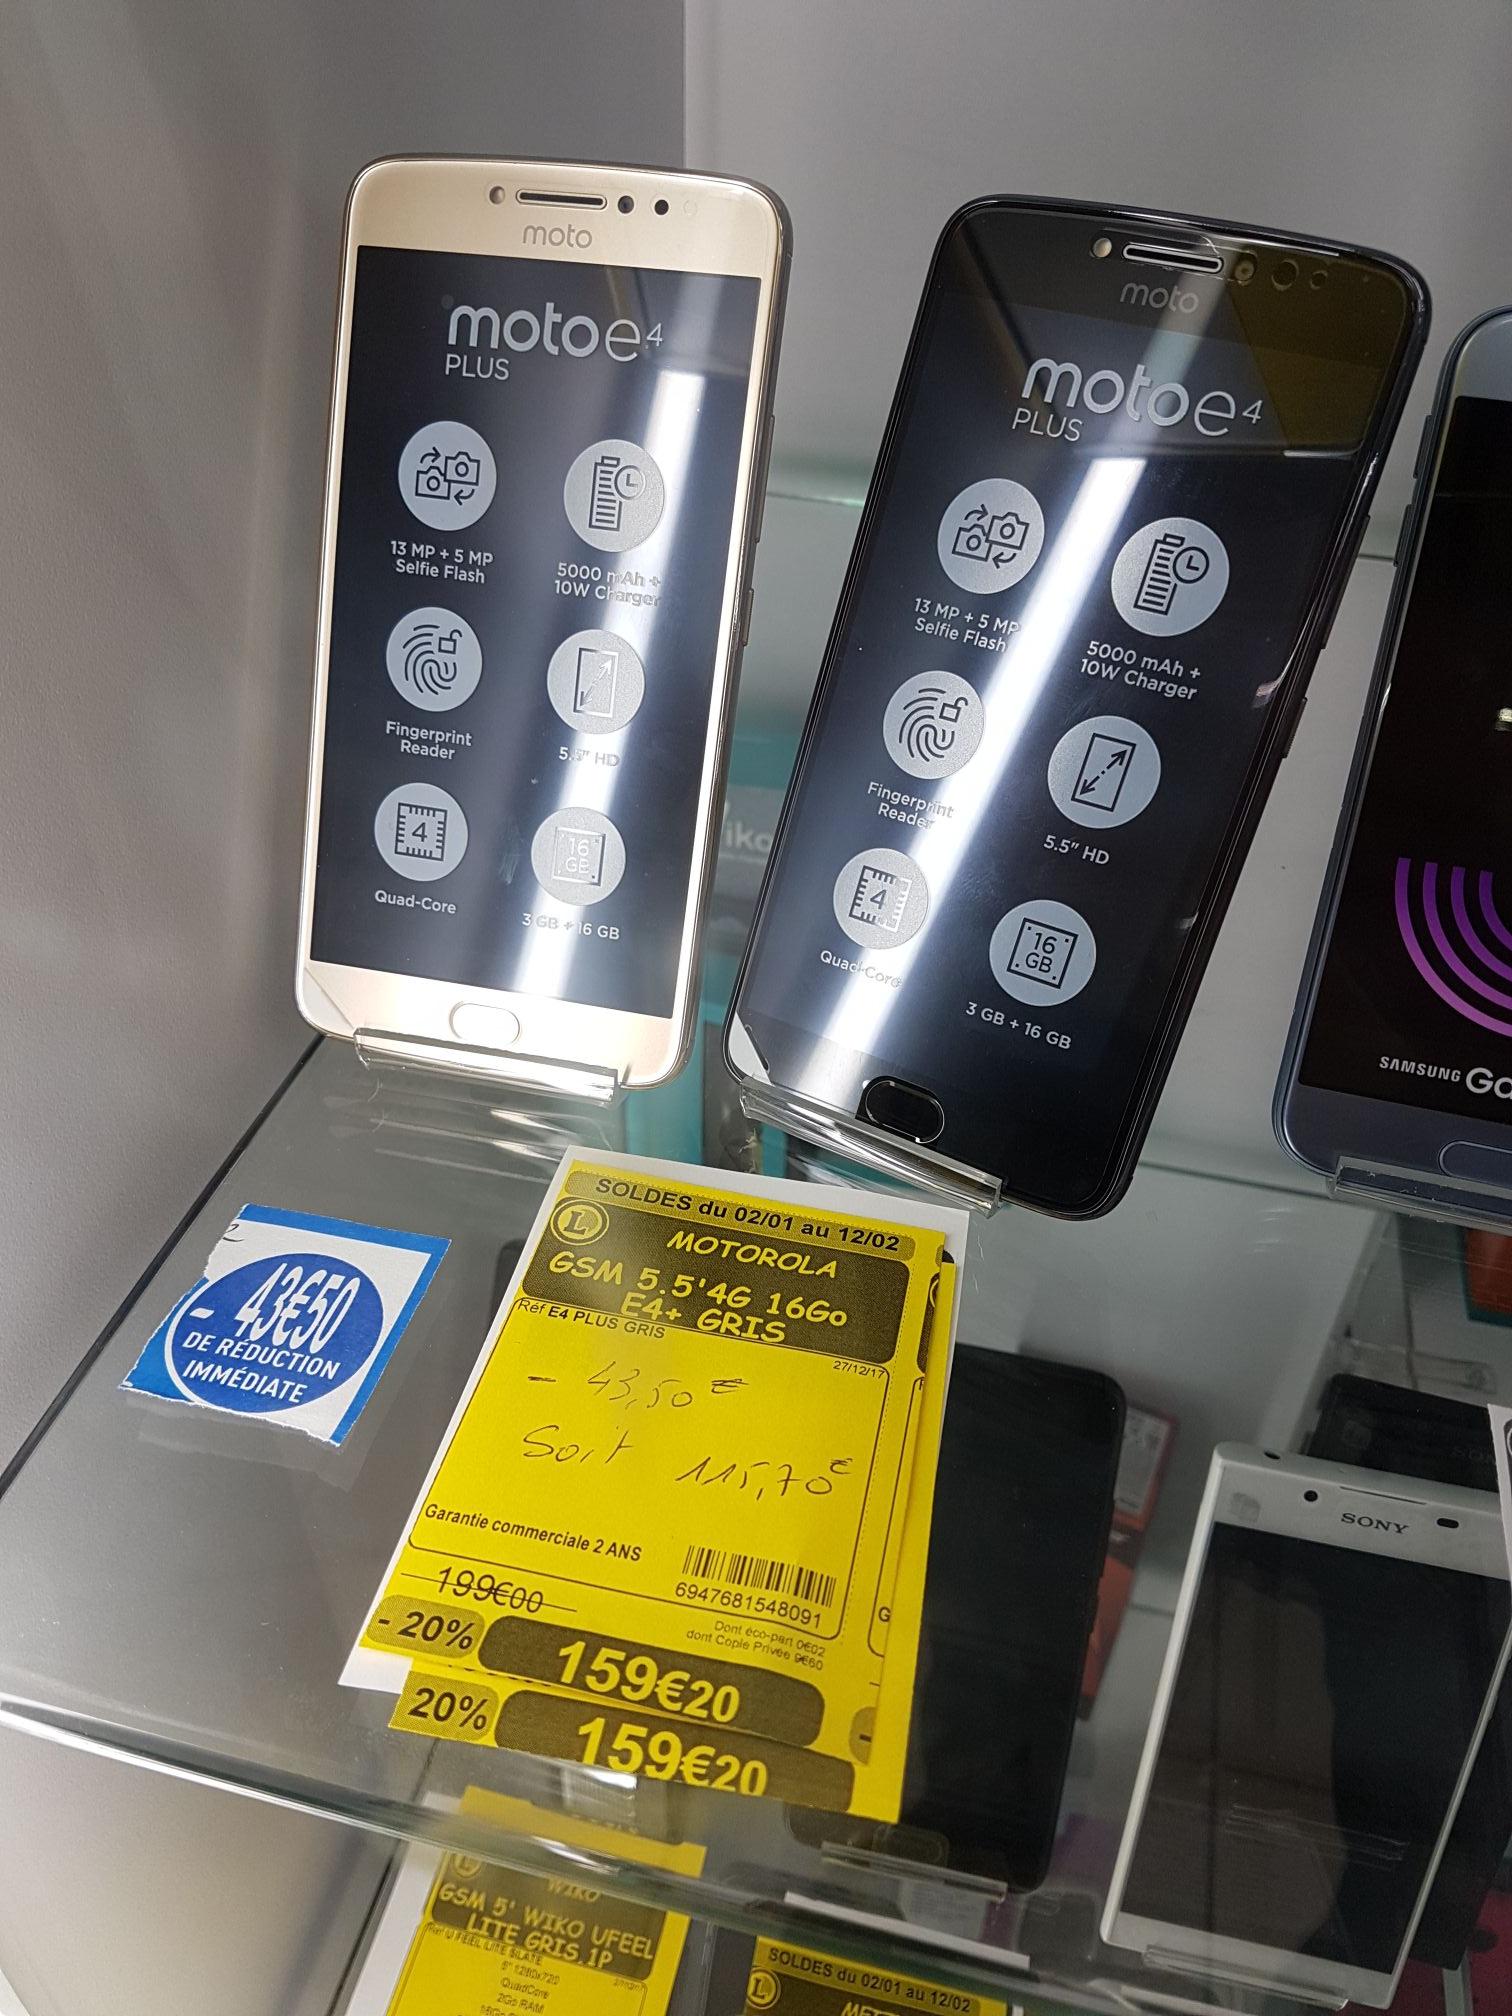 "Smartphone 5.5"" Motorola Moto E4 Plus - 3 Go RAM, 16 Go, Noir ou or  - Bar le duc (55)"